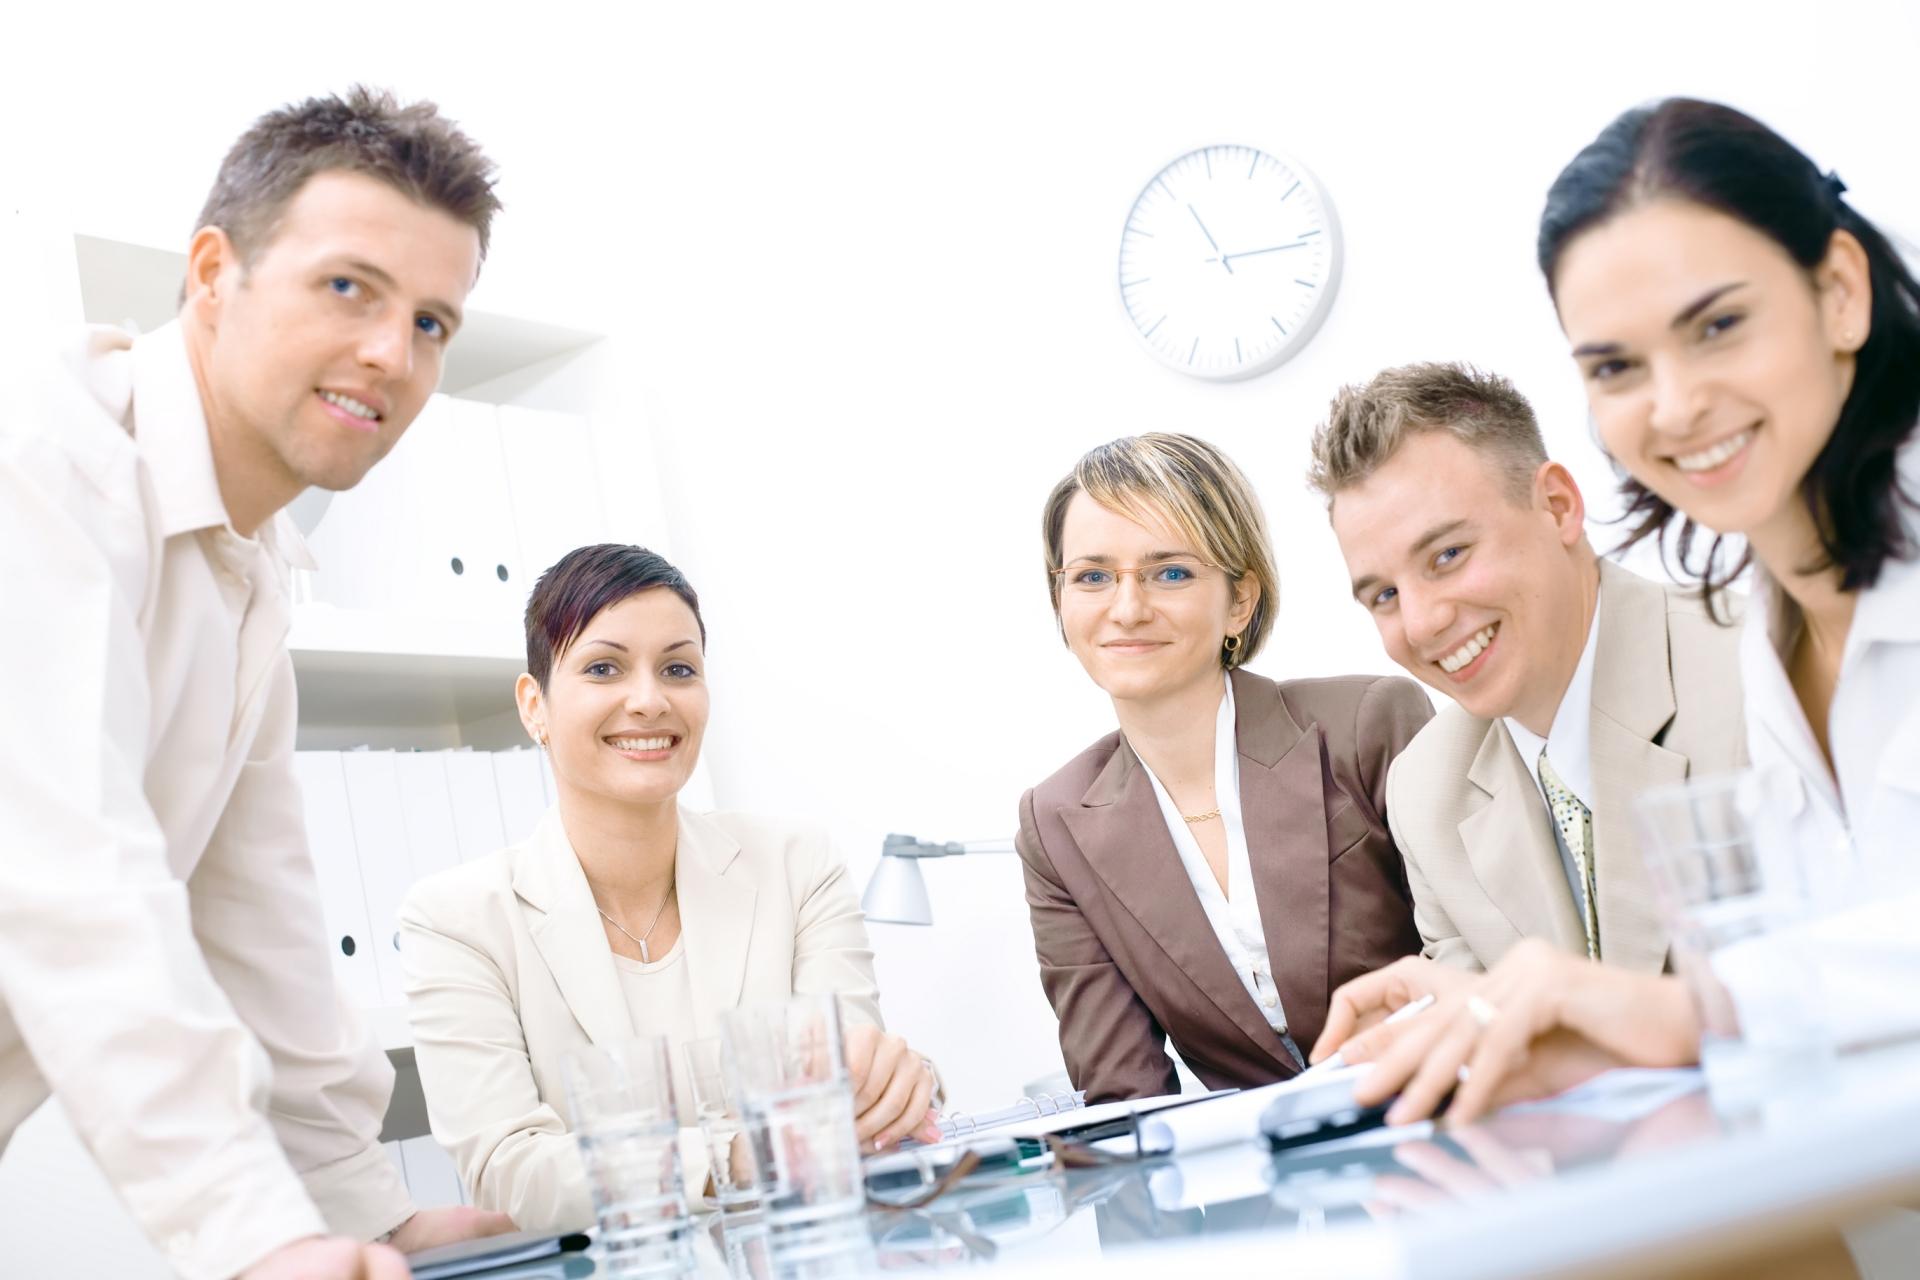 agenda x produktinformationen gruppenkalender teamwork